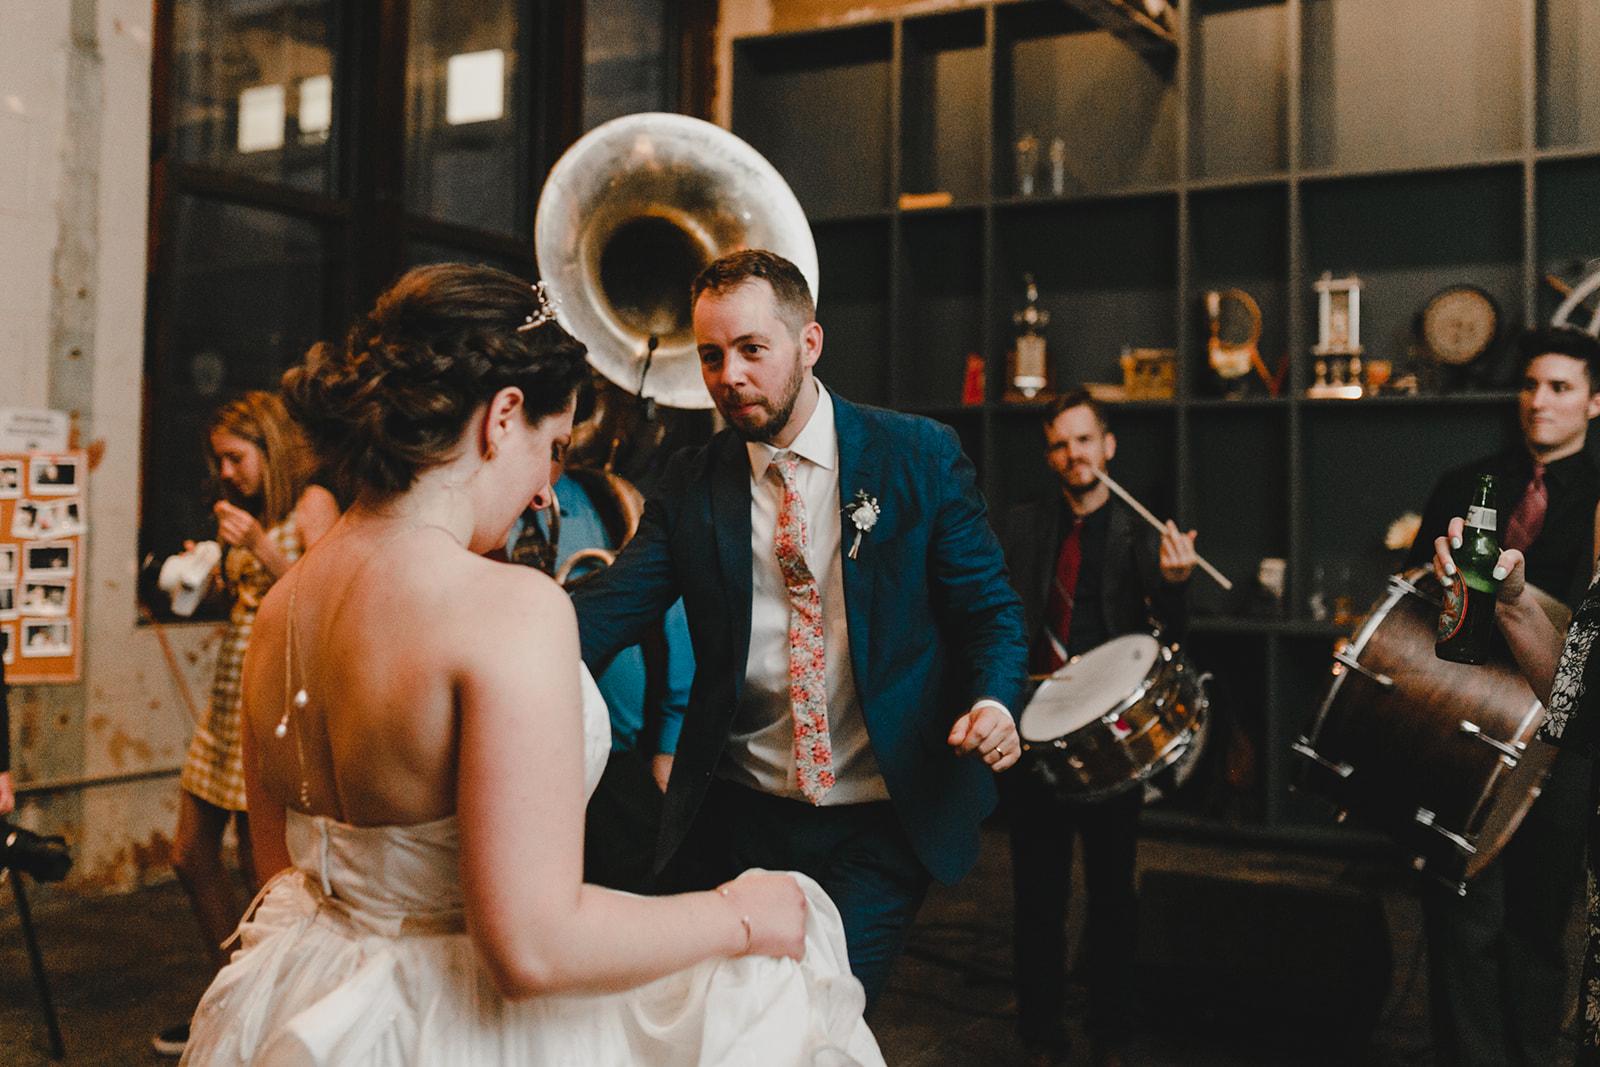 bok-wedding-philadelphia-sarah-rich-25.jpg